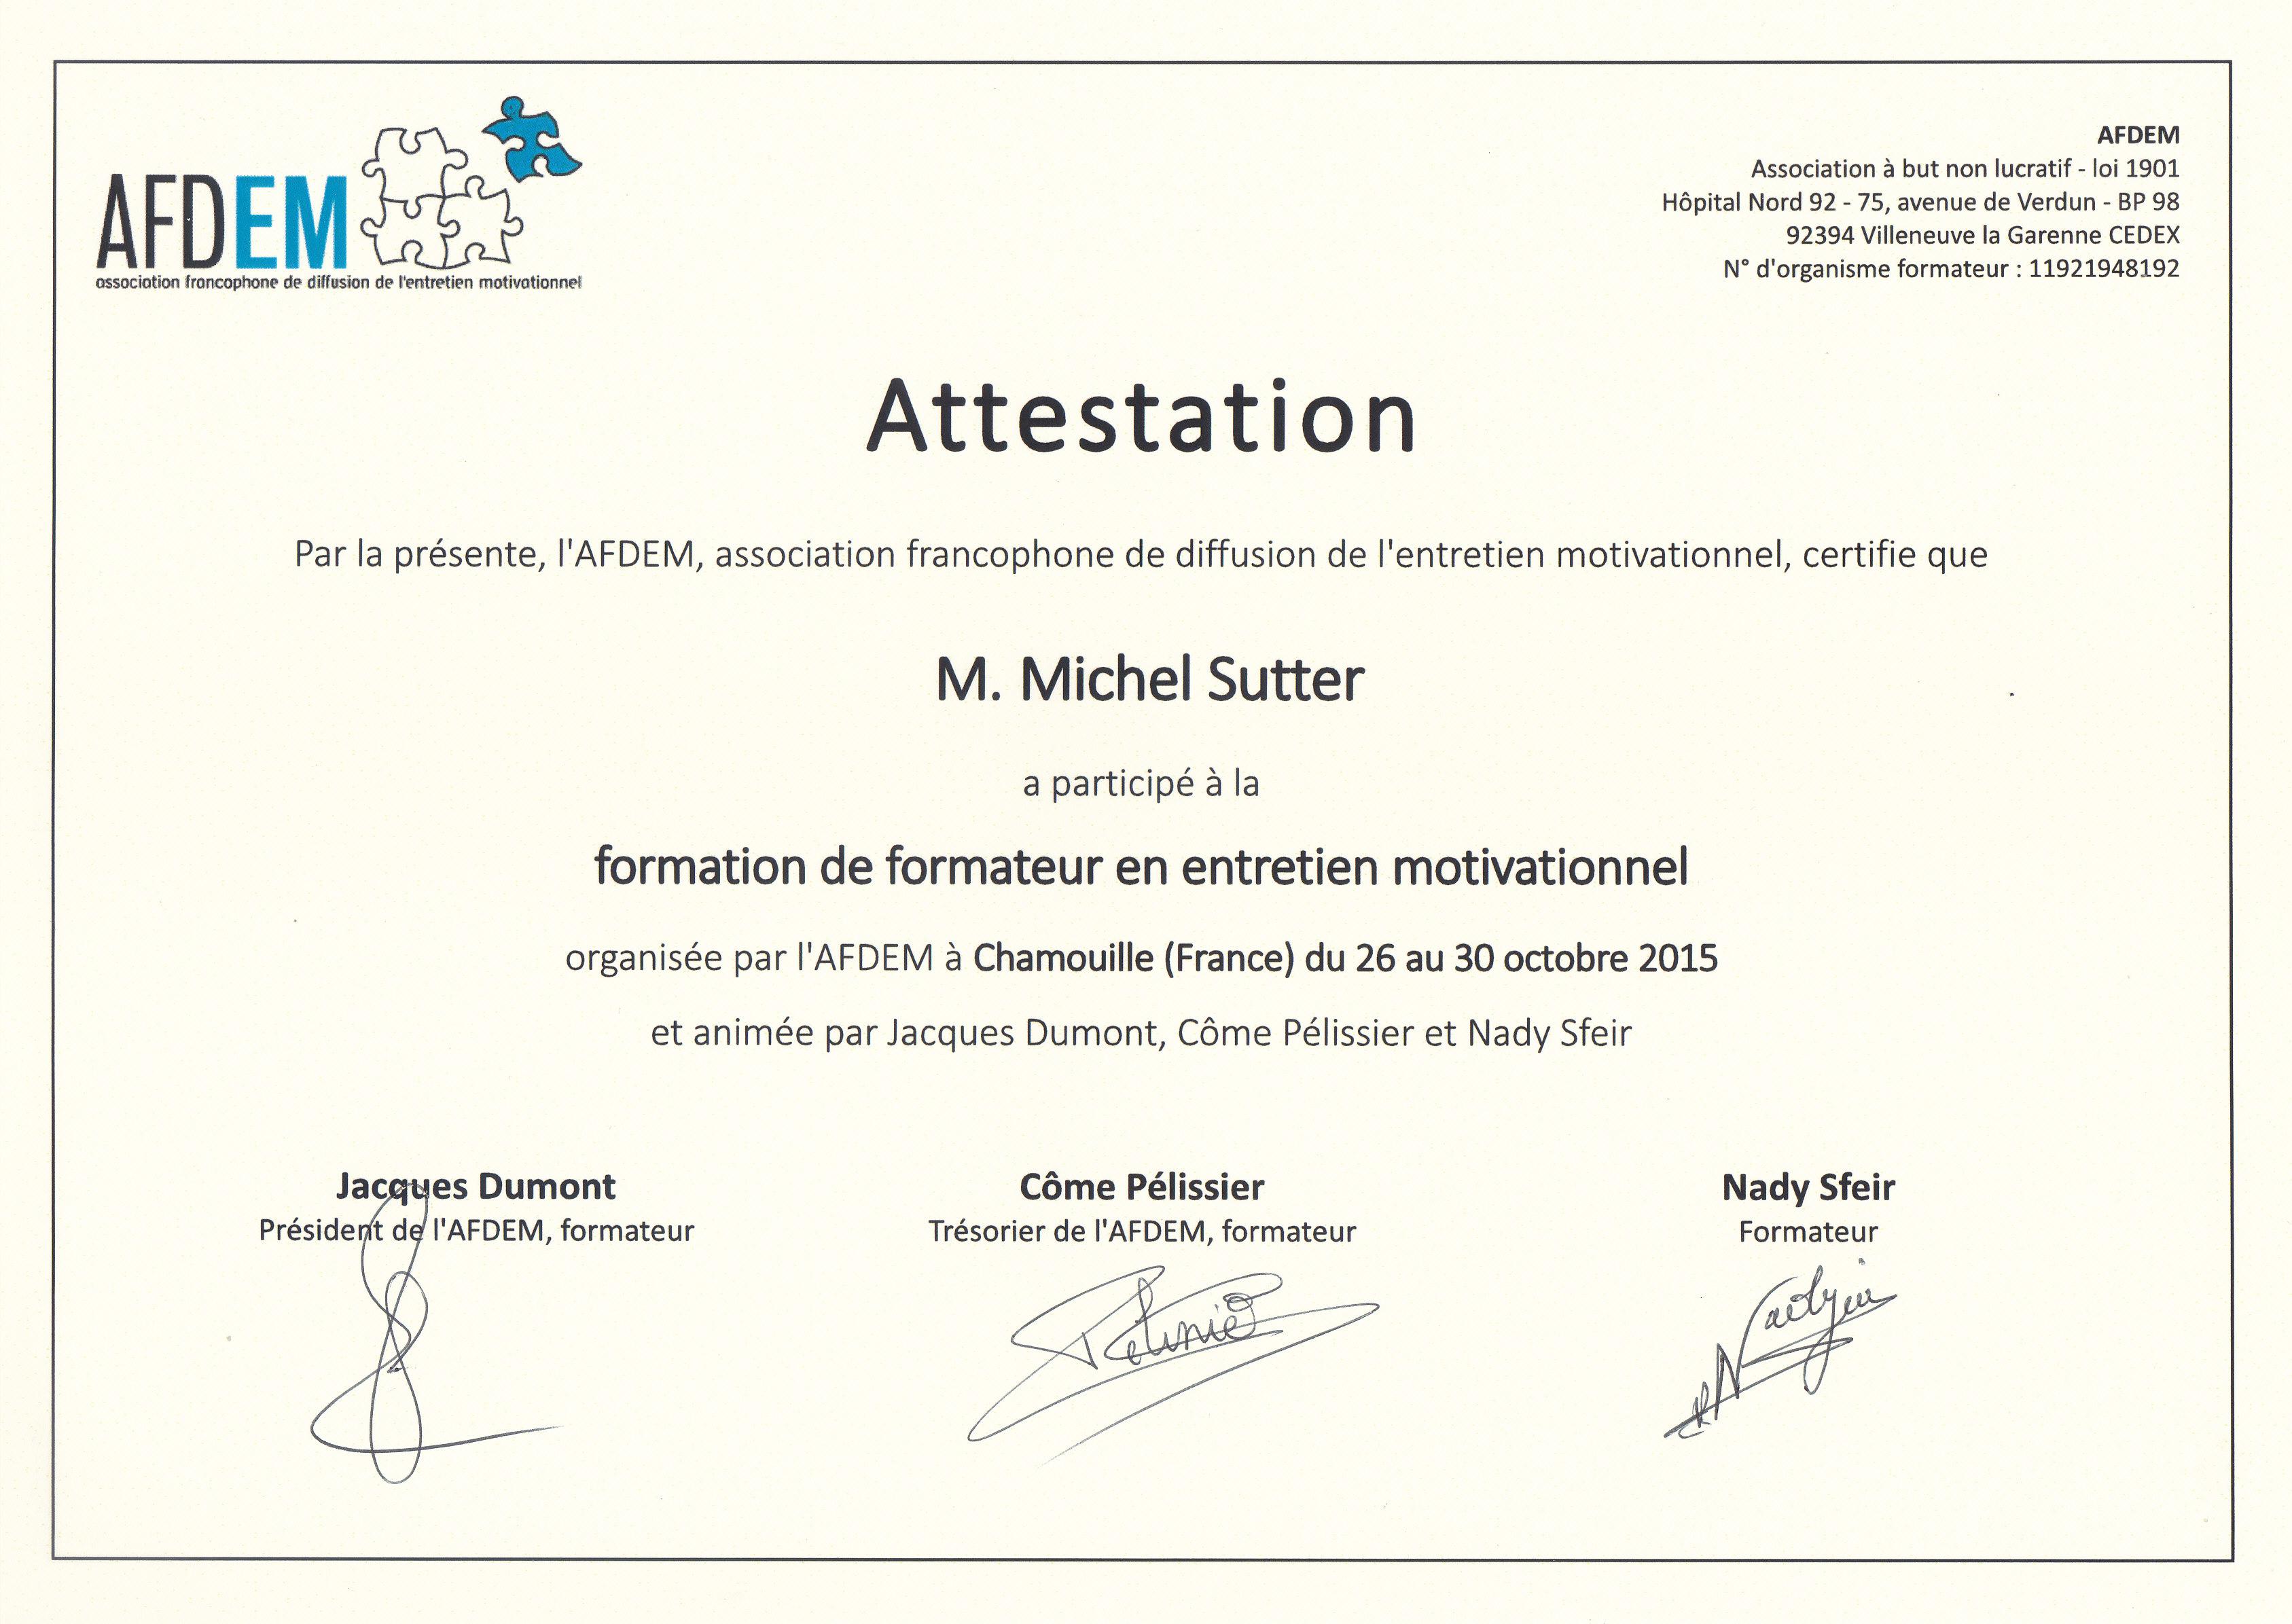 Formation de formateurs en entretien motivationnel - Attestation de tva 10 ...